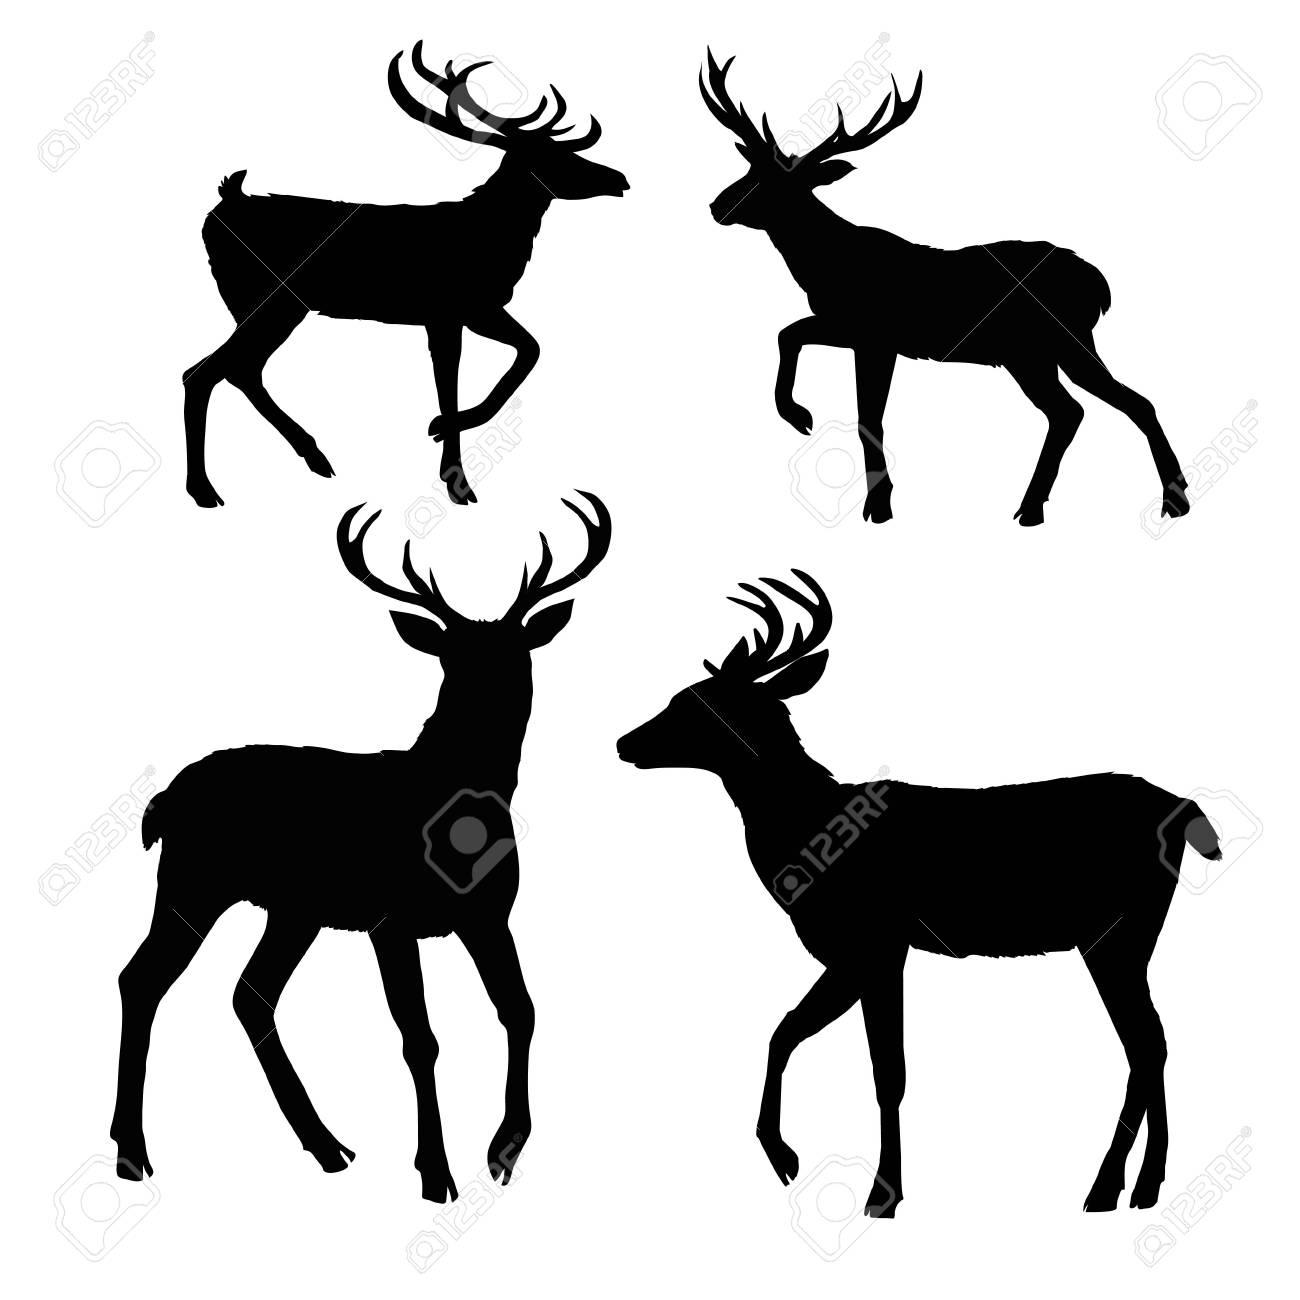 deer silhouette, vector, illustration, animal, black, nature - 102791877